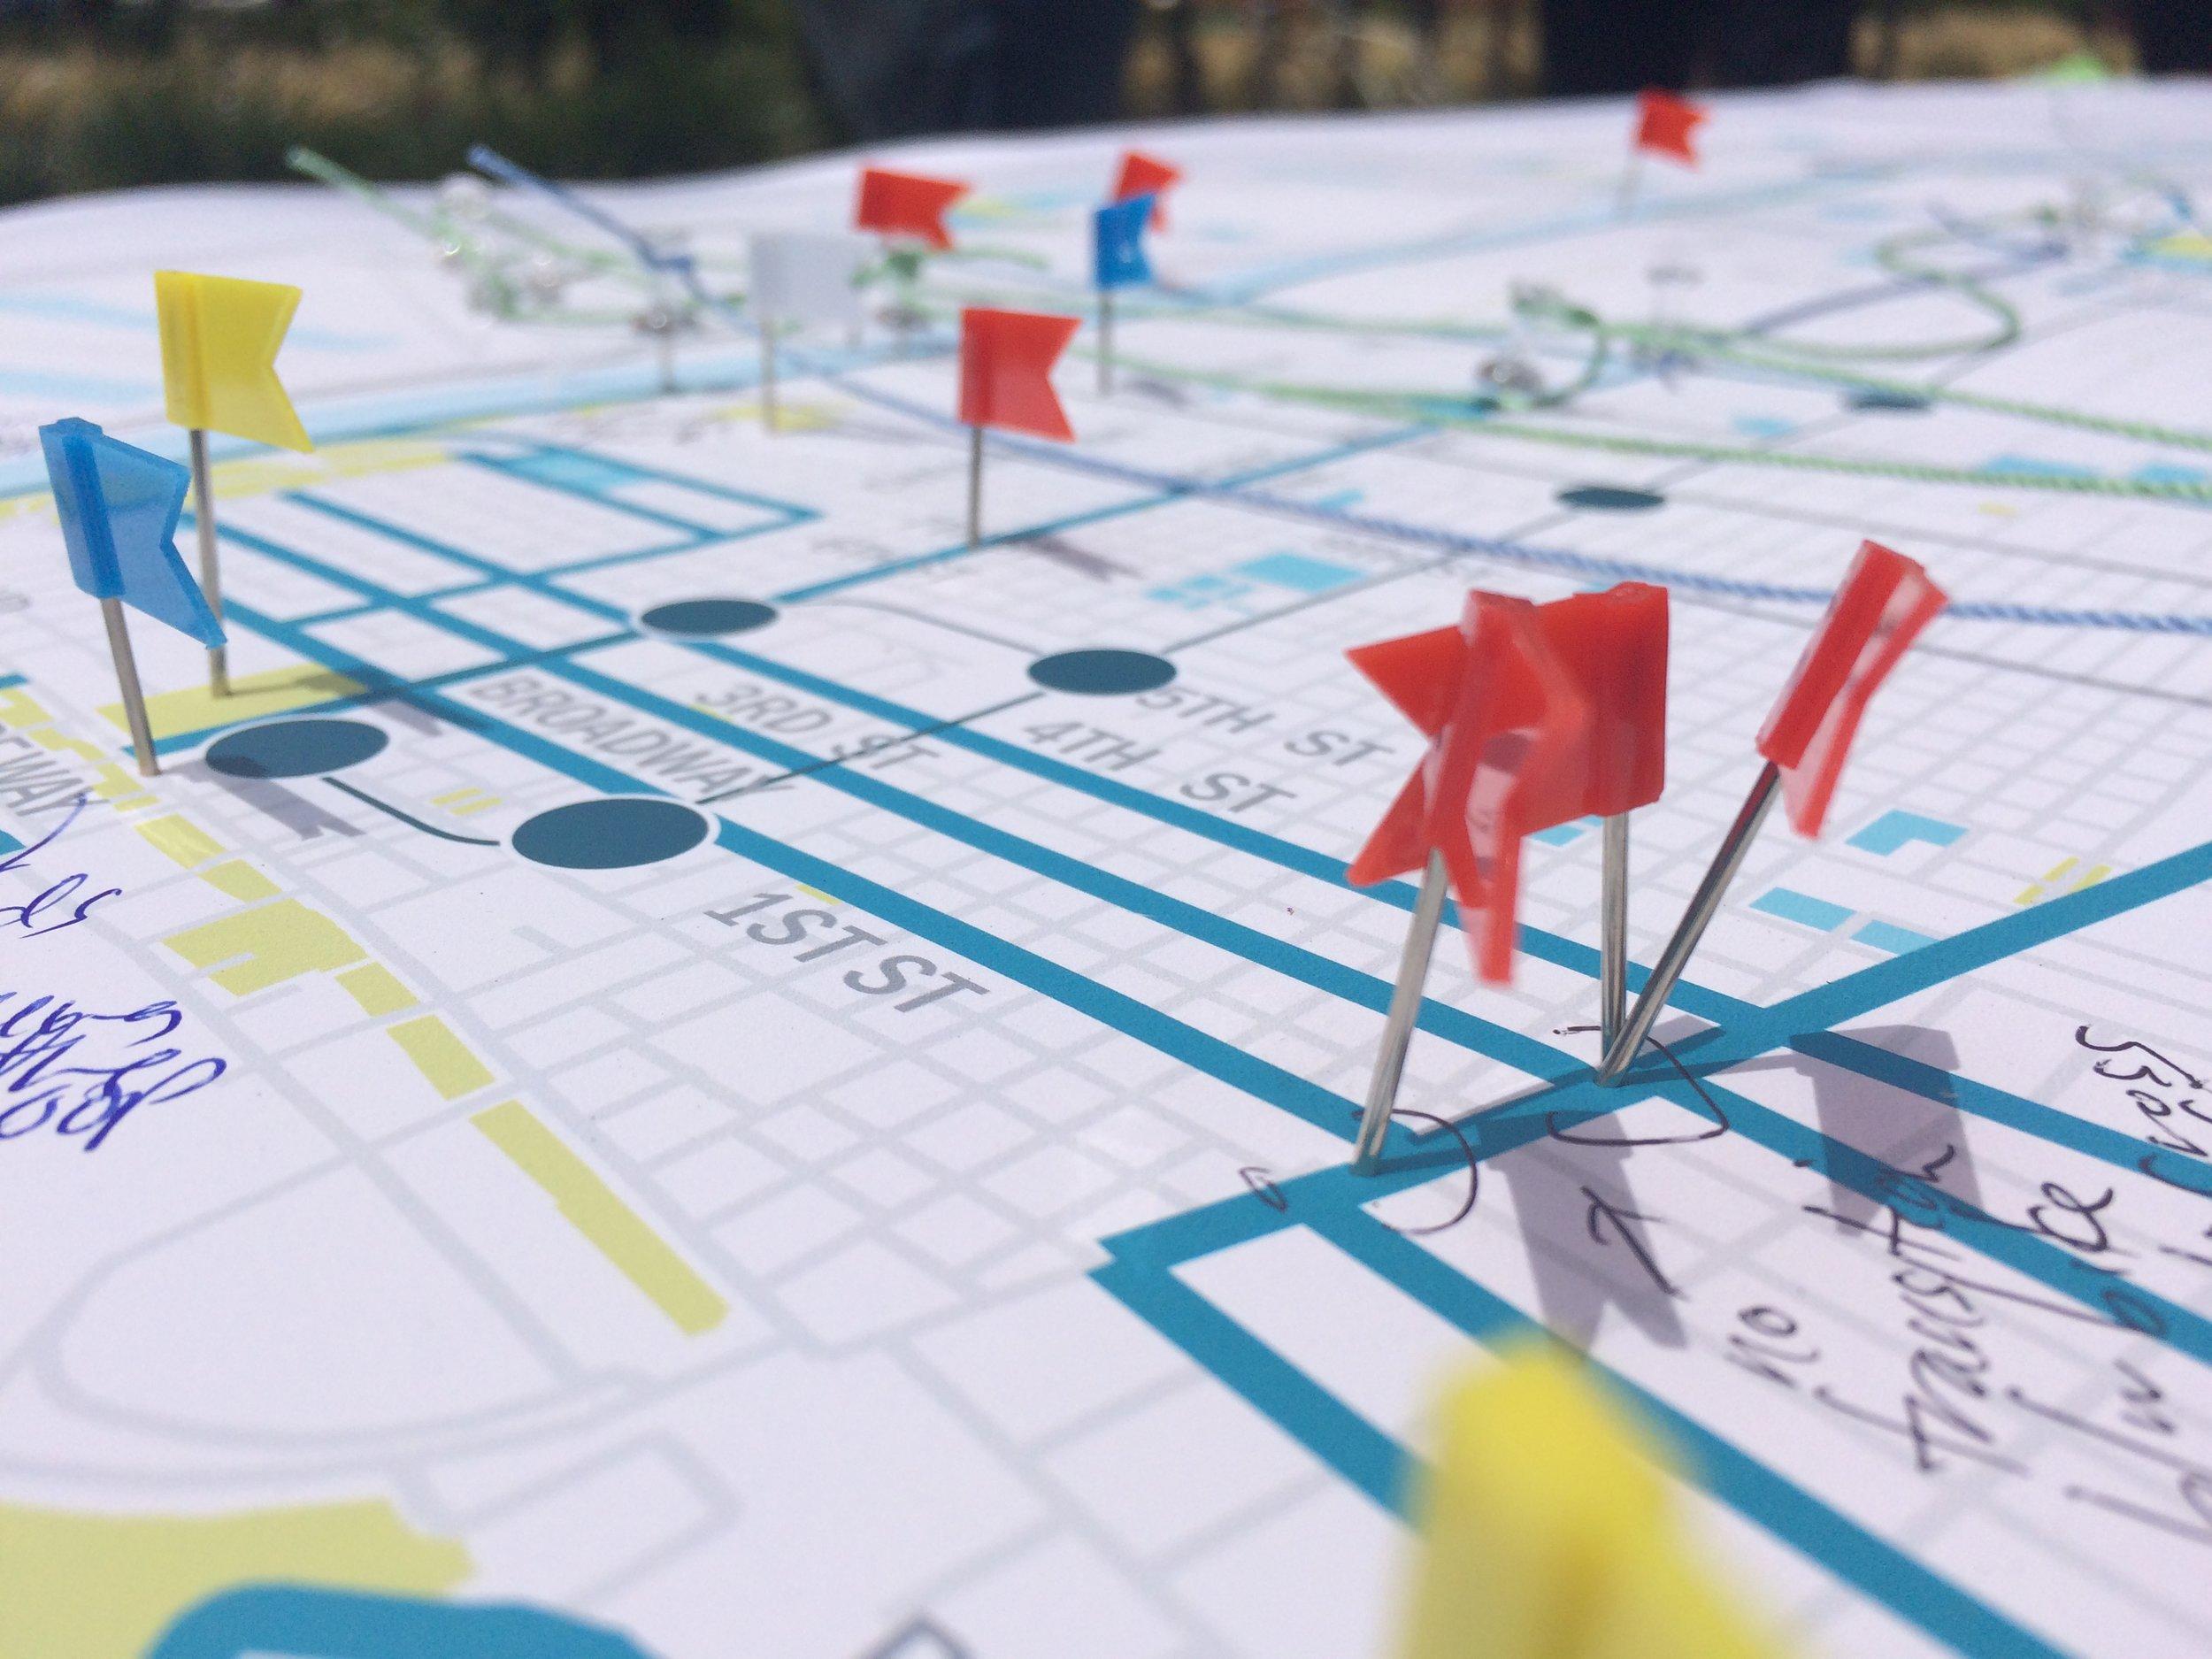 Interactive Mapping Pop-Ups (Long Beach, CA)